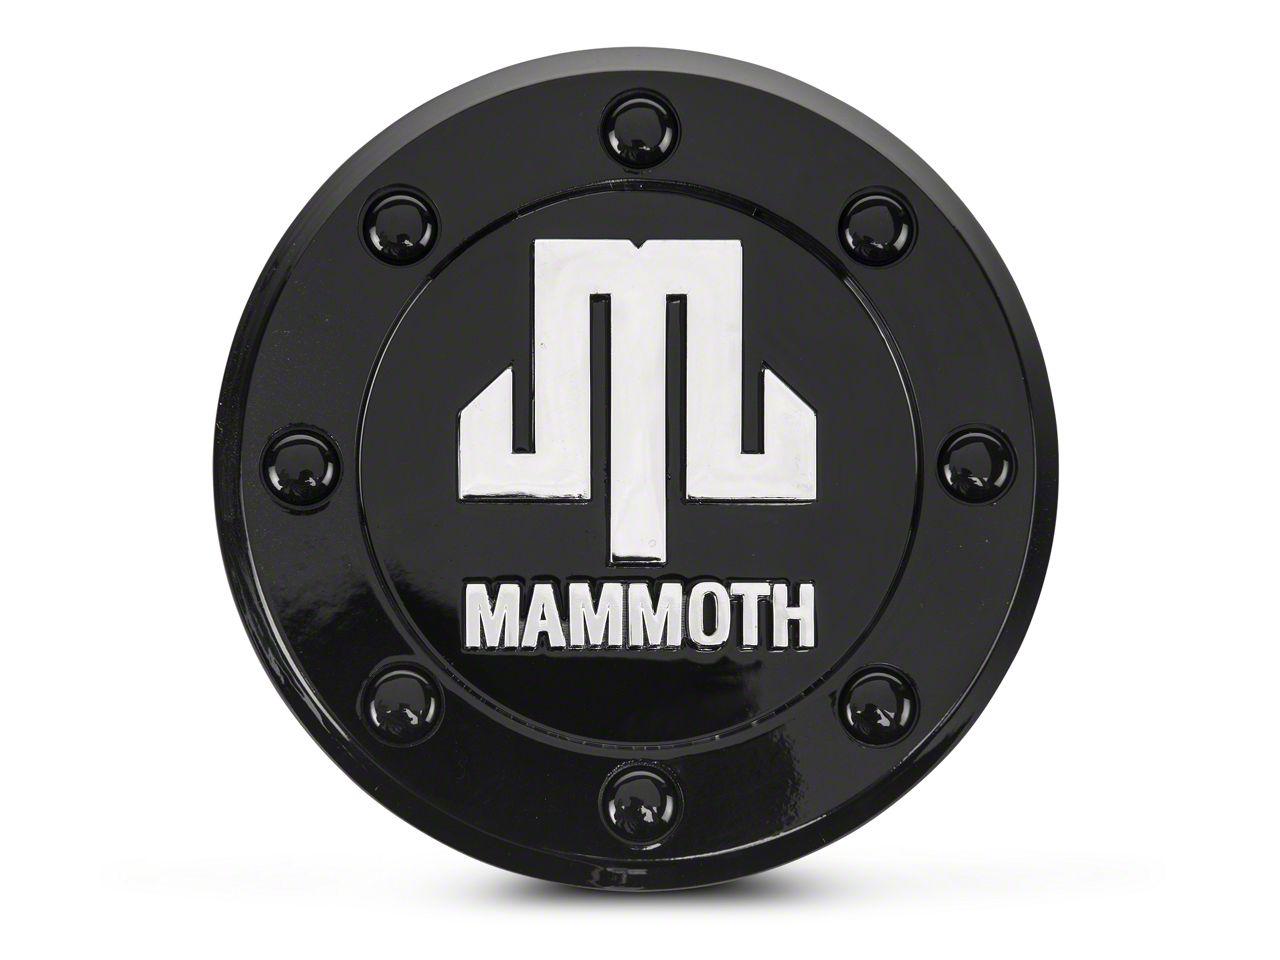 Mammoth 8 Center Cap (07-19 Jeep Wrangler JK & JL)